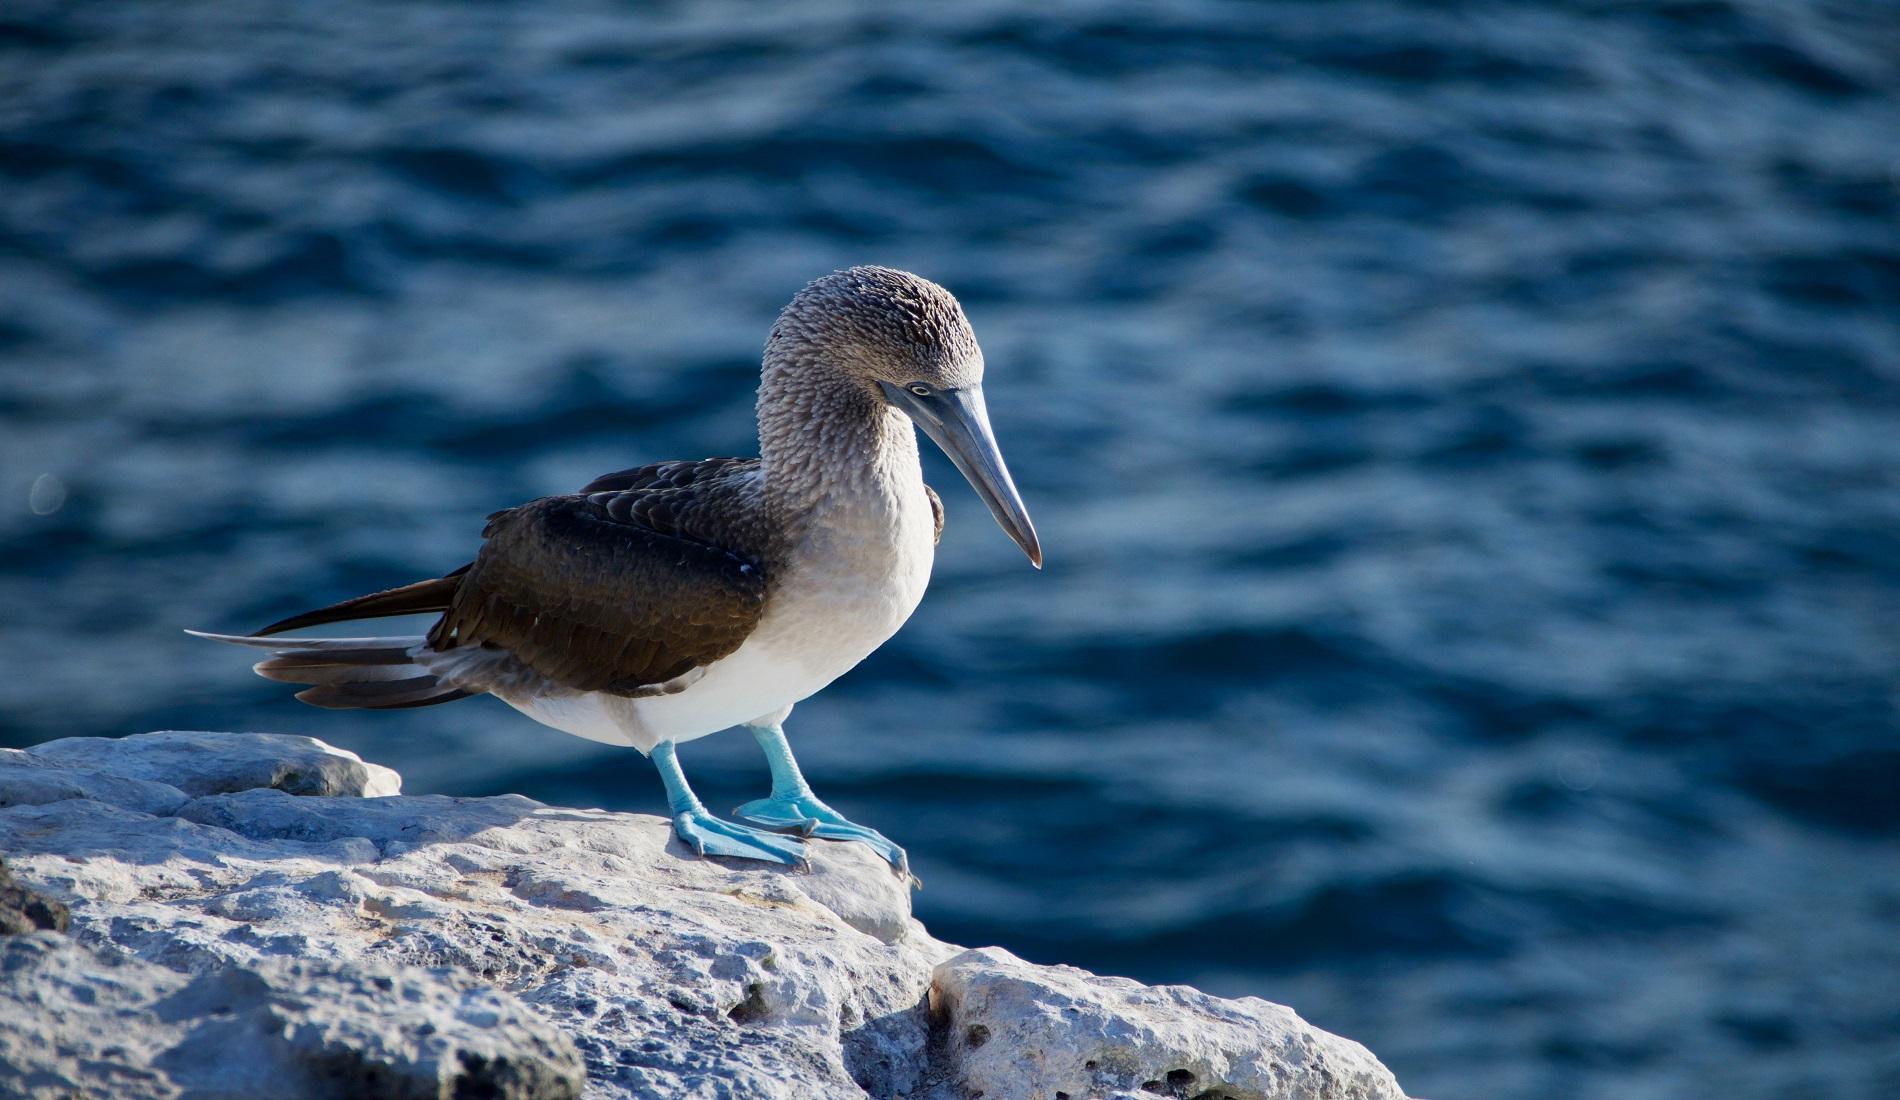 eilandhoppen galapagos eilanden blauwvoetgent